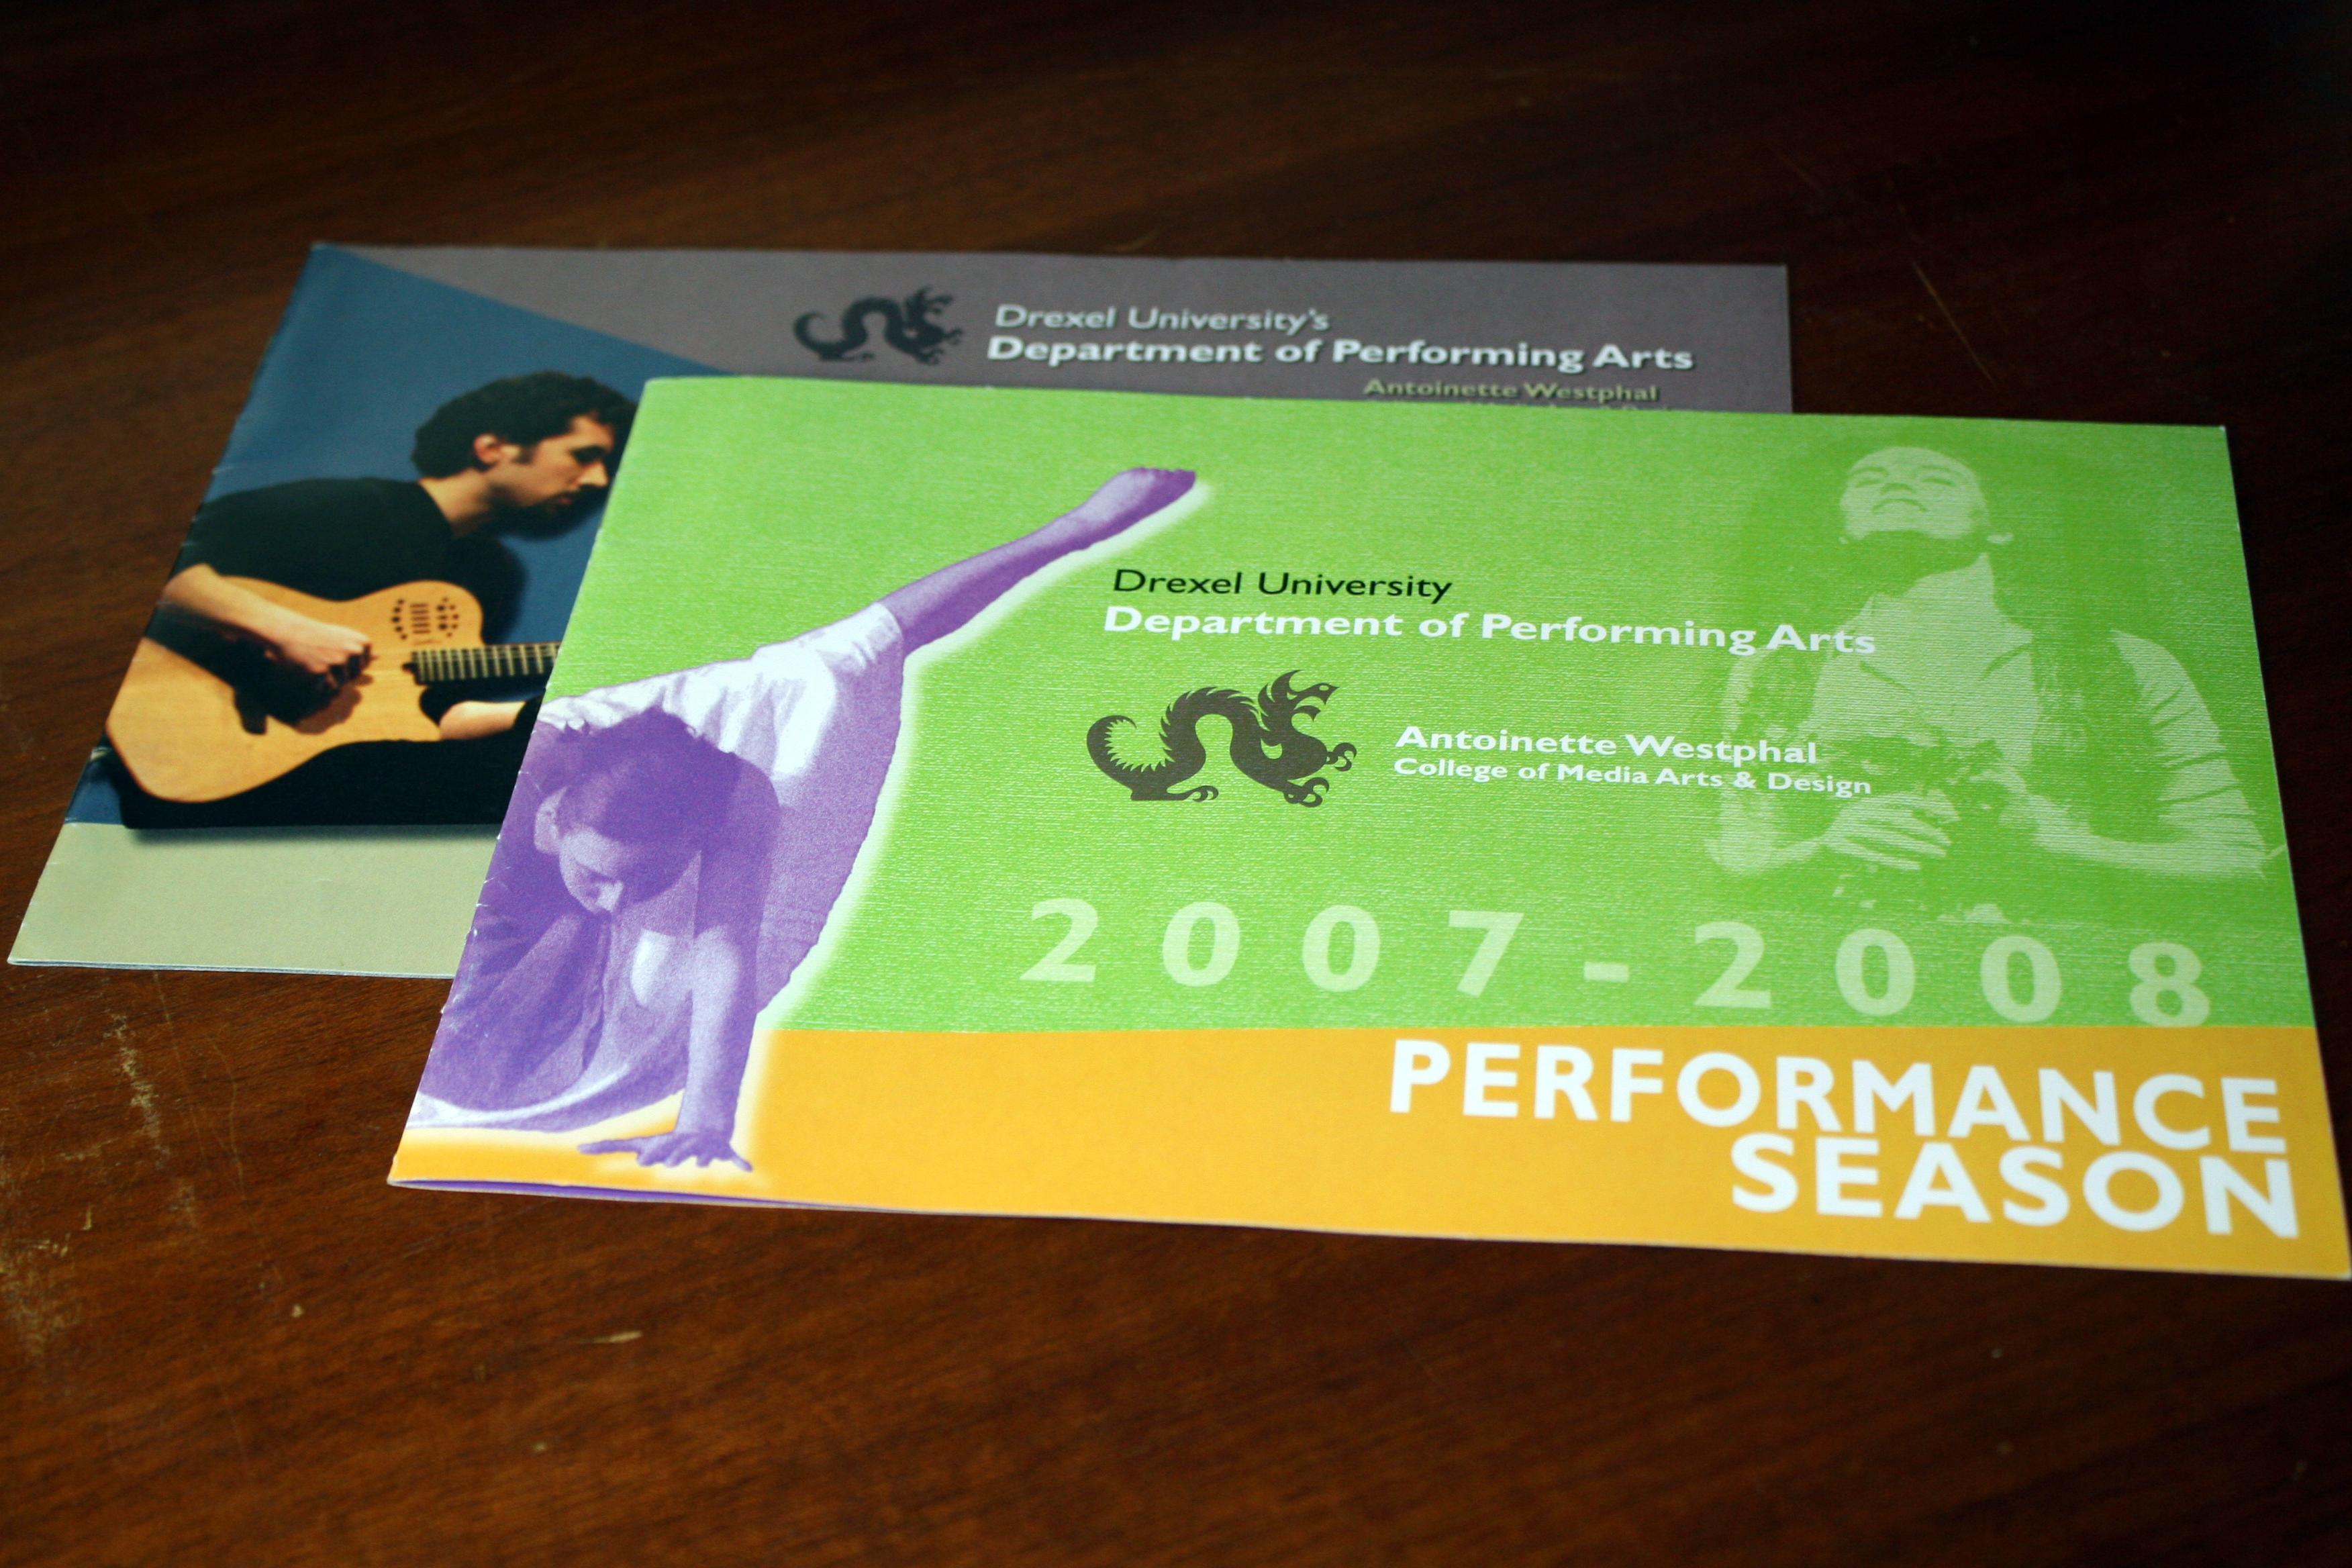 Drexel University Department of Performing Arts brochures